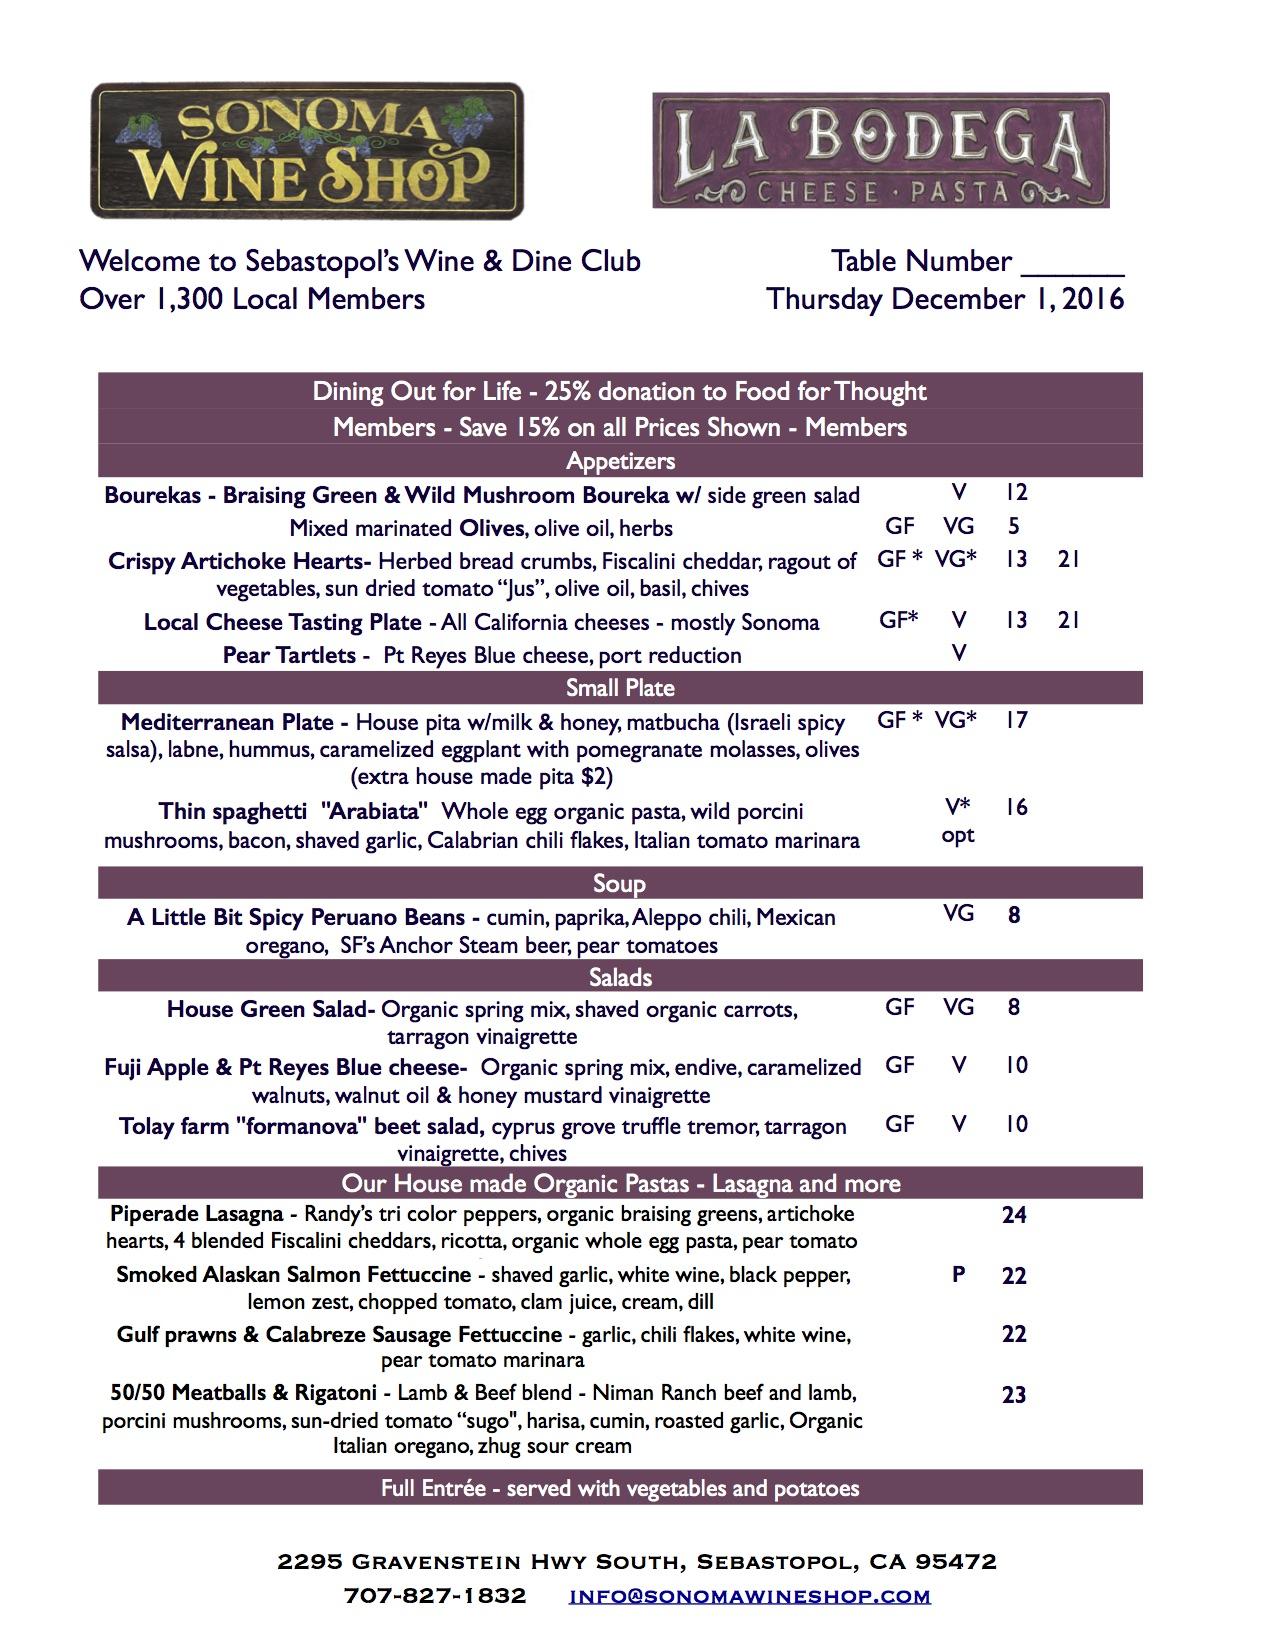 Super menu from Rick and team